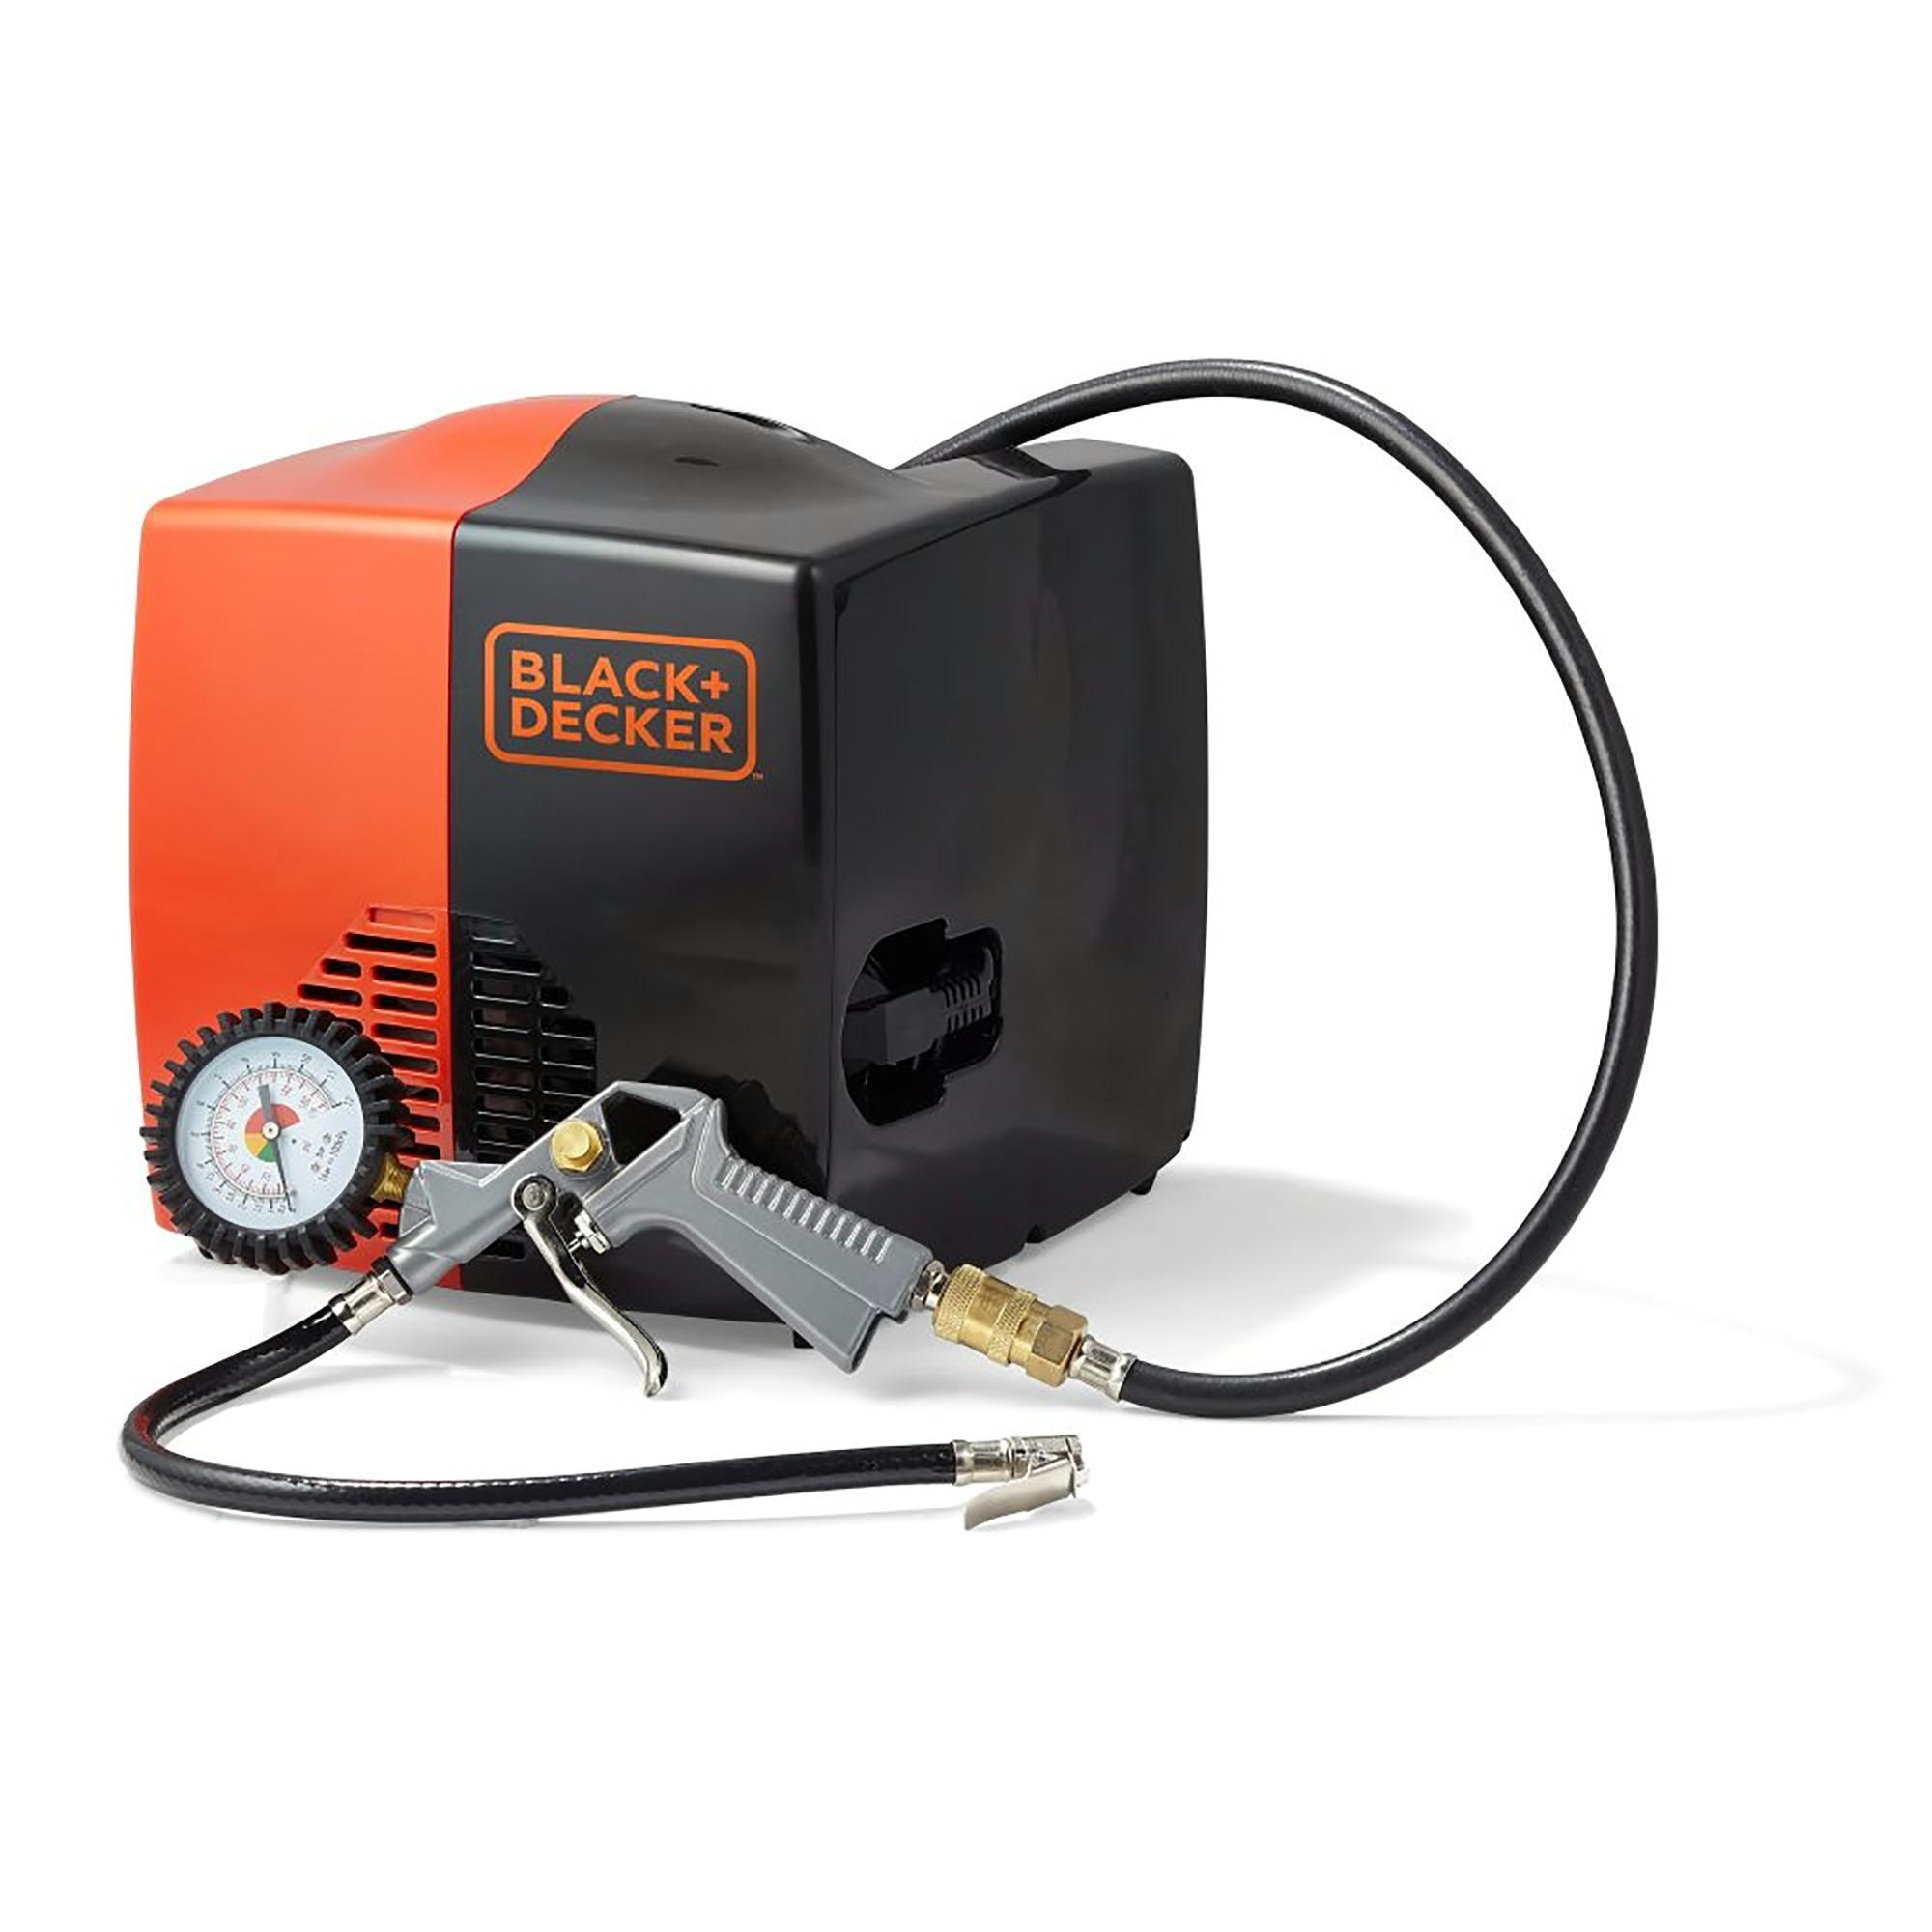 Black+Decker compressor Cubo